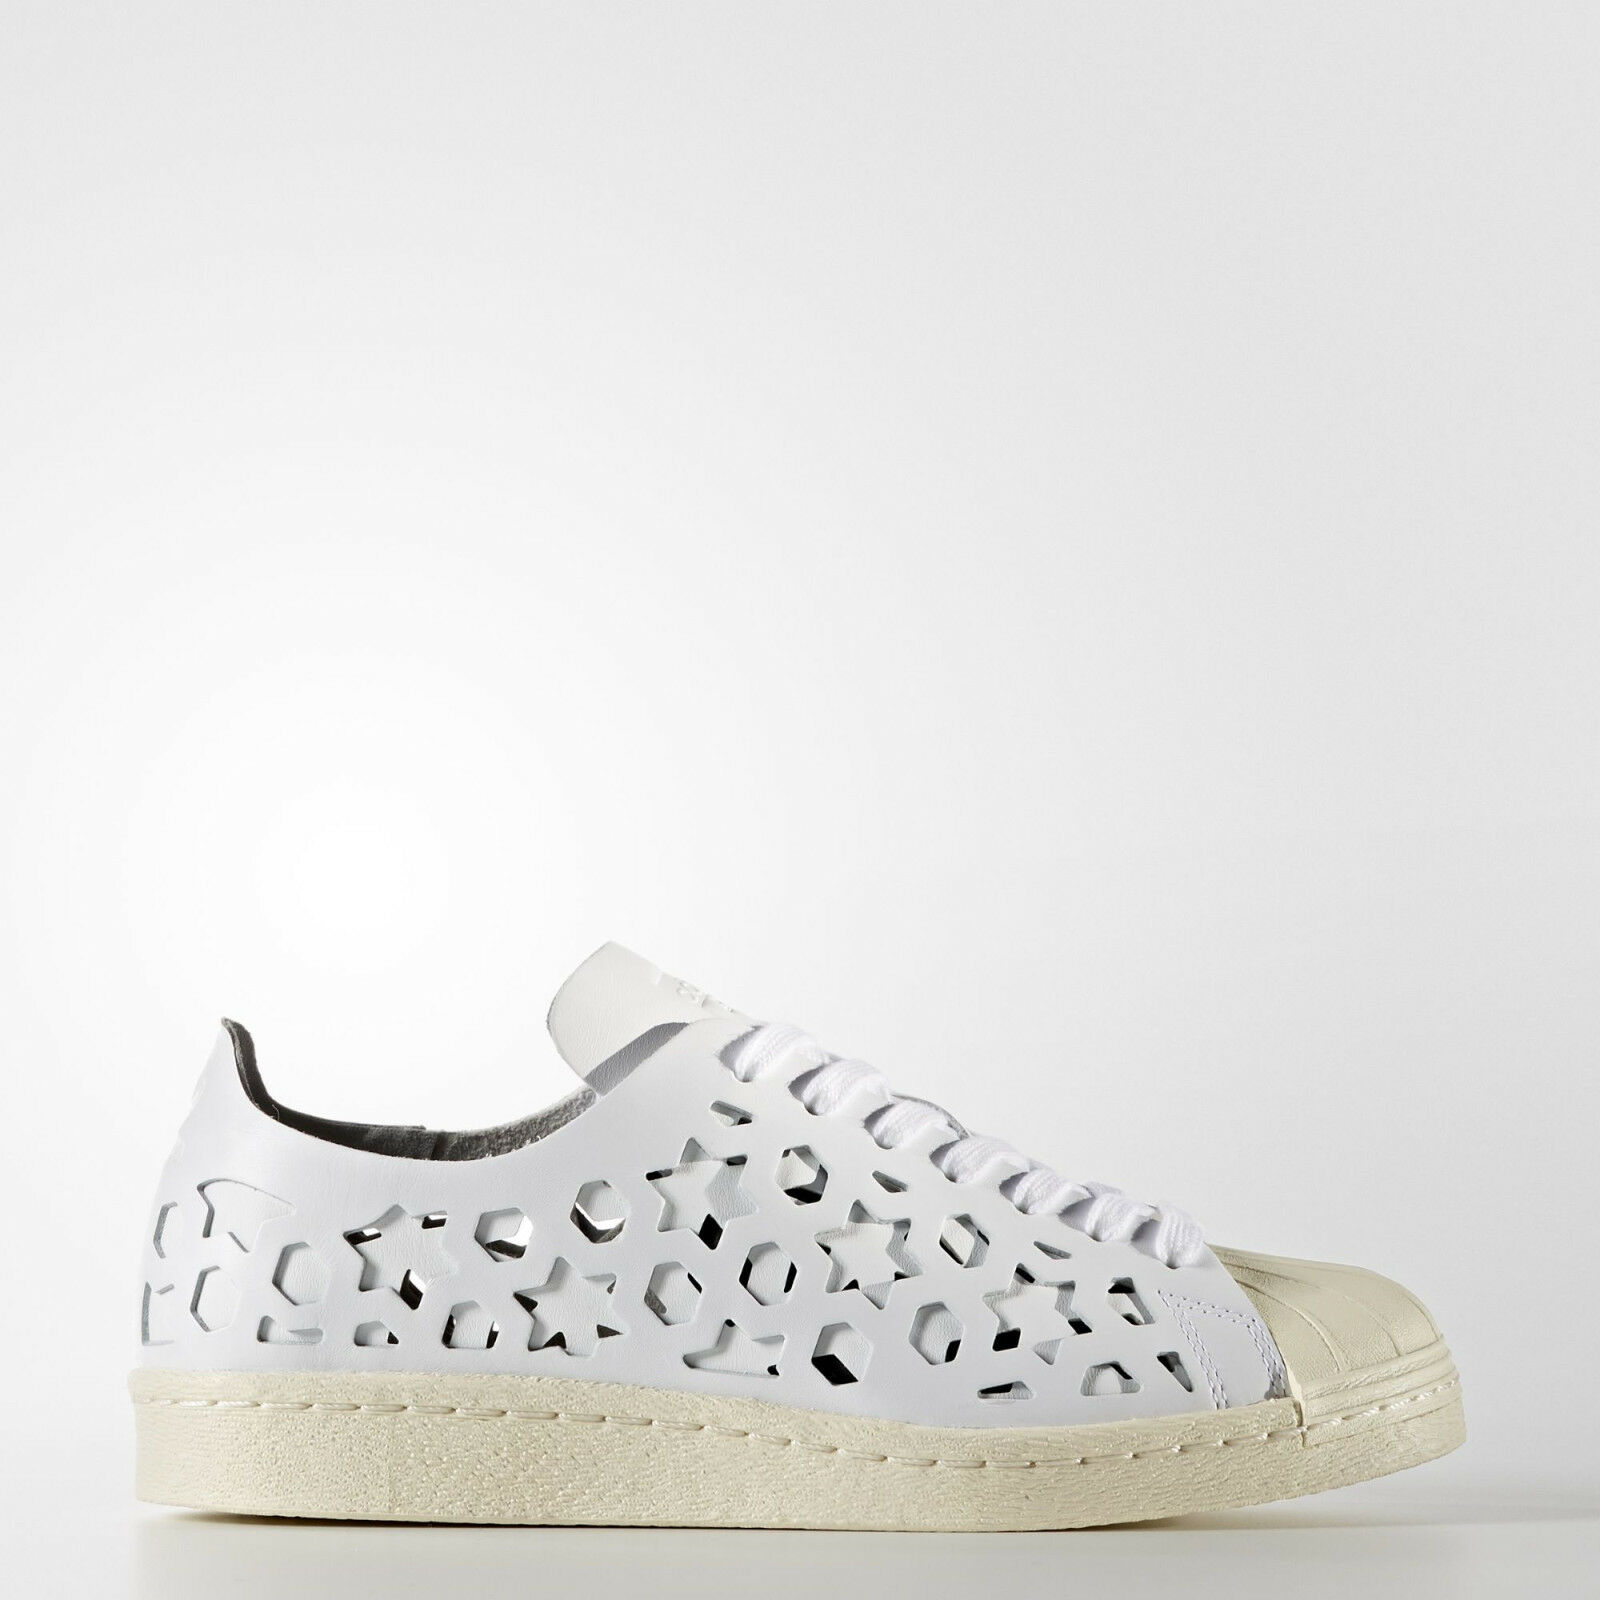 nib~Adidas Original SUPERSTAR 80s CUT OUT LEATHER Campus honey Shoe~Women size 8